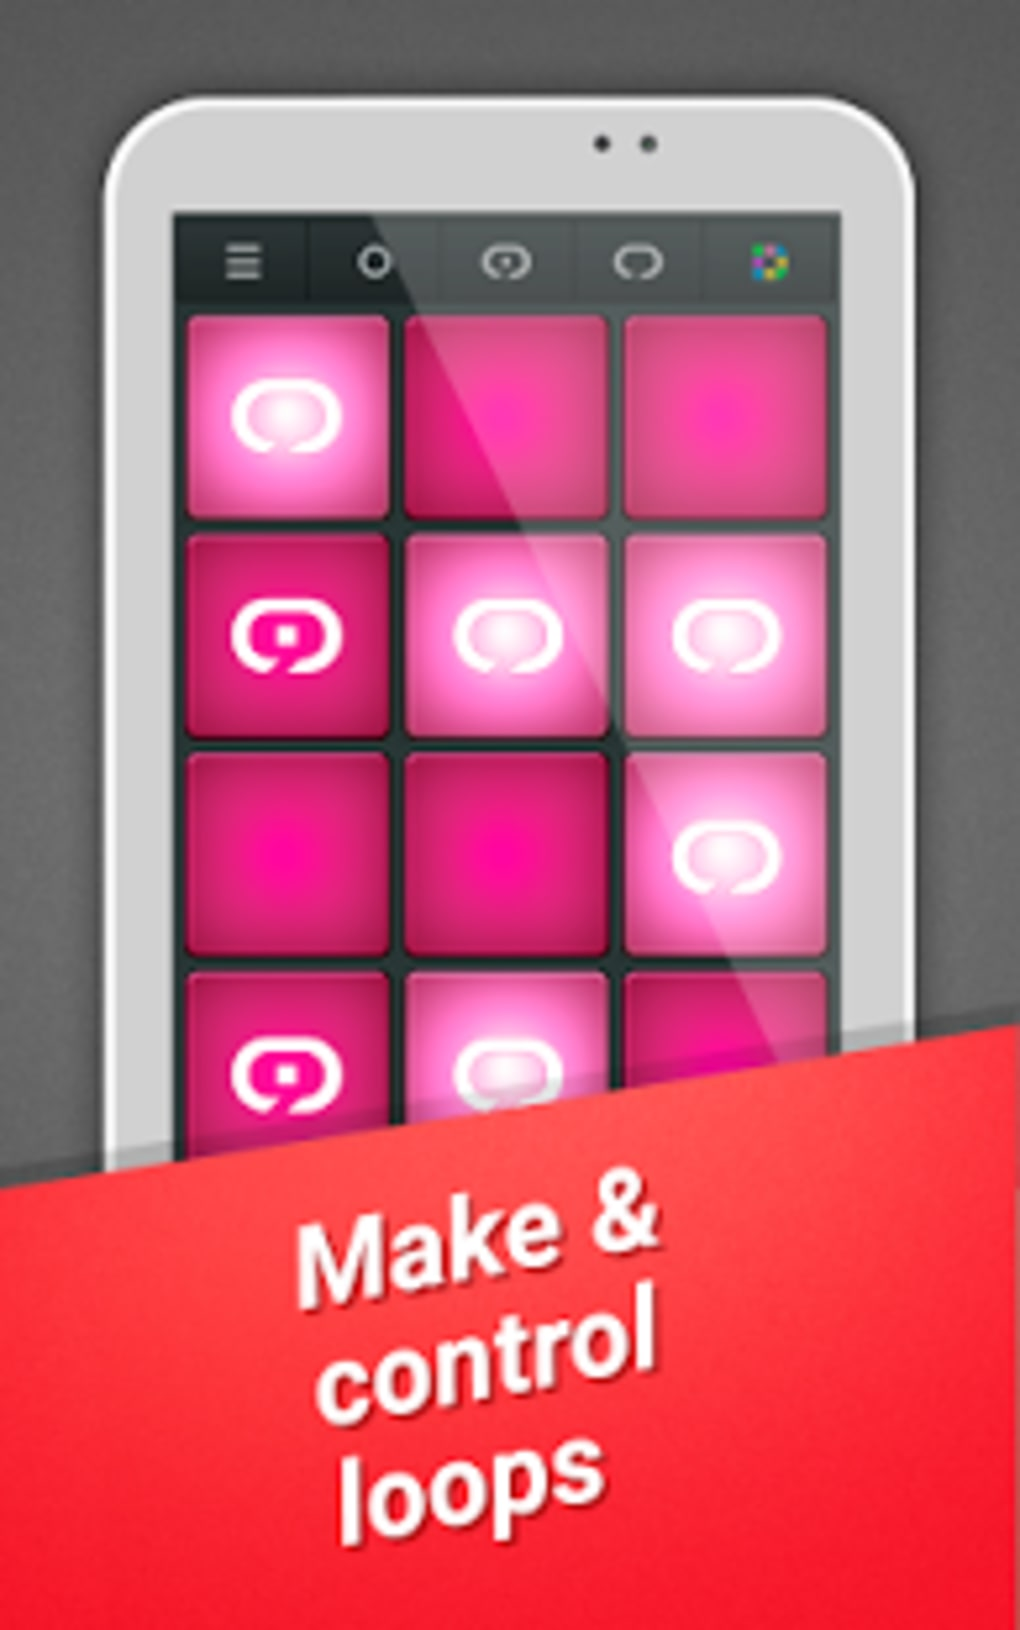 Drum Pad Machine Full Apk Cracked : club drum pad machine for android download ~ Hamham.info Haus und Dekorationen